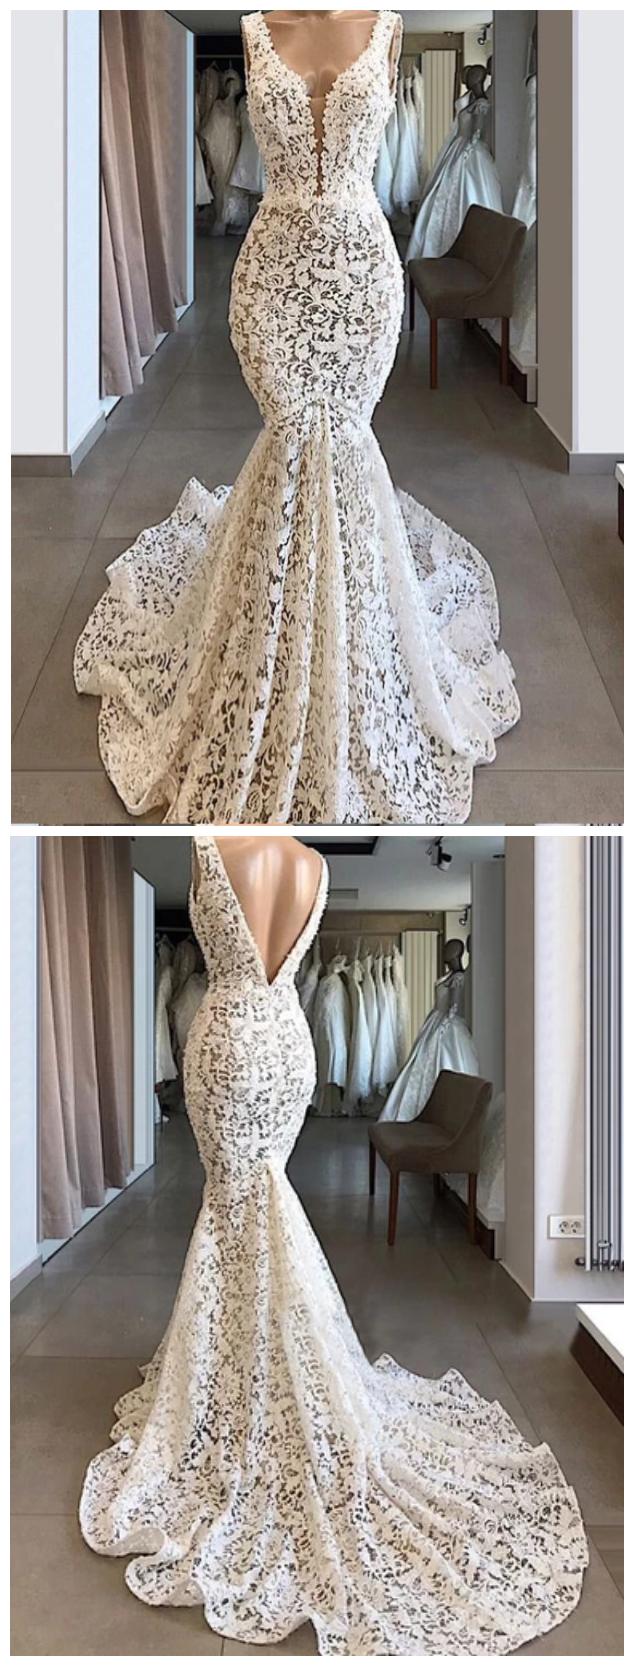 Ivory Lace Mermaid Trumpet Vintage Formal Wedding Dresses Short Prom Dress Chiffon Evening Dresses Cheap Formal Dresses Chiffon Prom Dress [ 1500 x 1000 Pixel ]